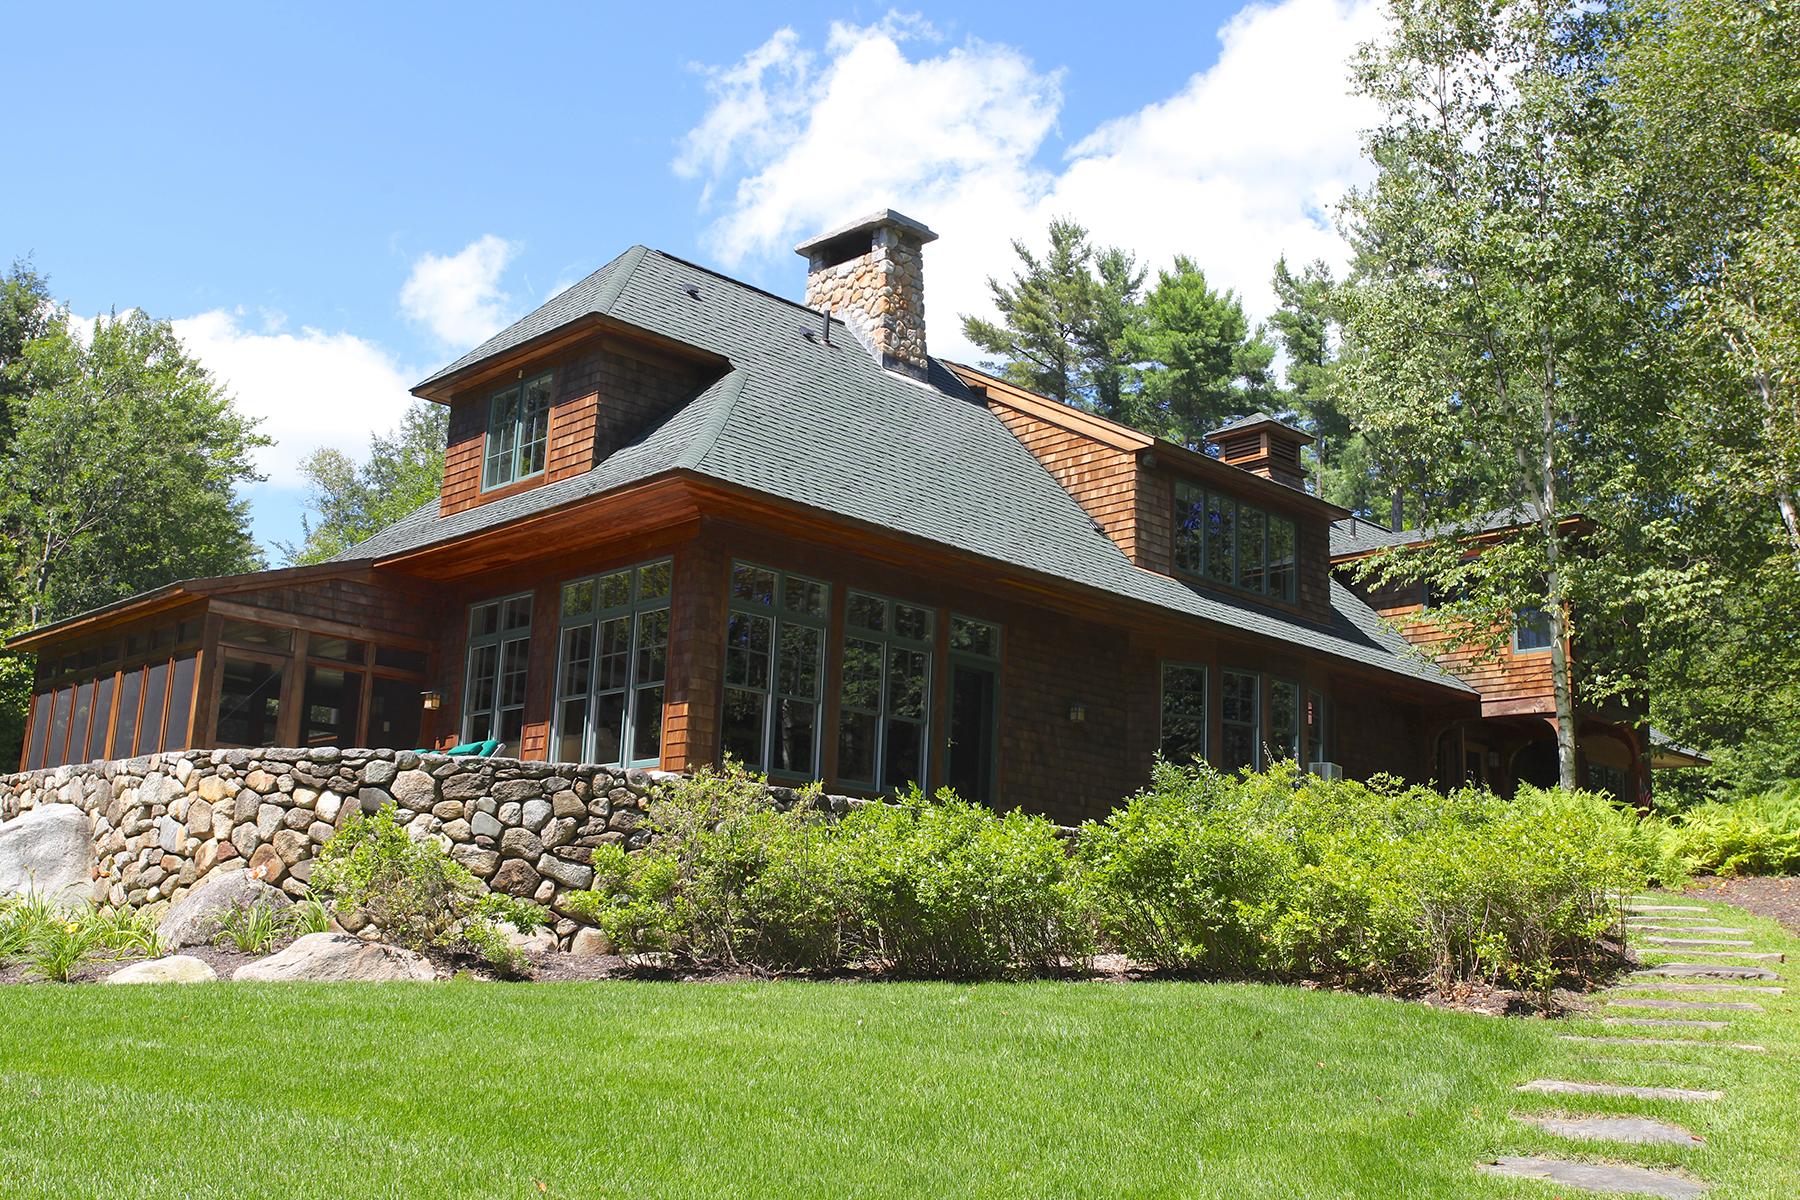 Single Family Home for Sale at 27 Burkehaven Lane, Sunapee 27 Burkehaven Ln Sunapee, New Hampshire, 03782 United States